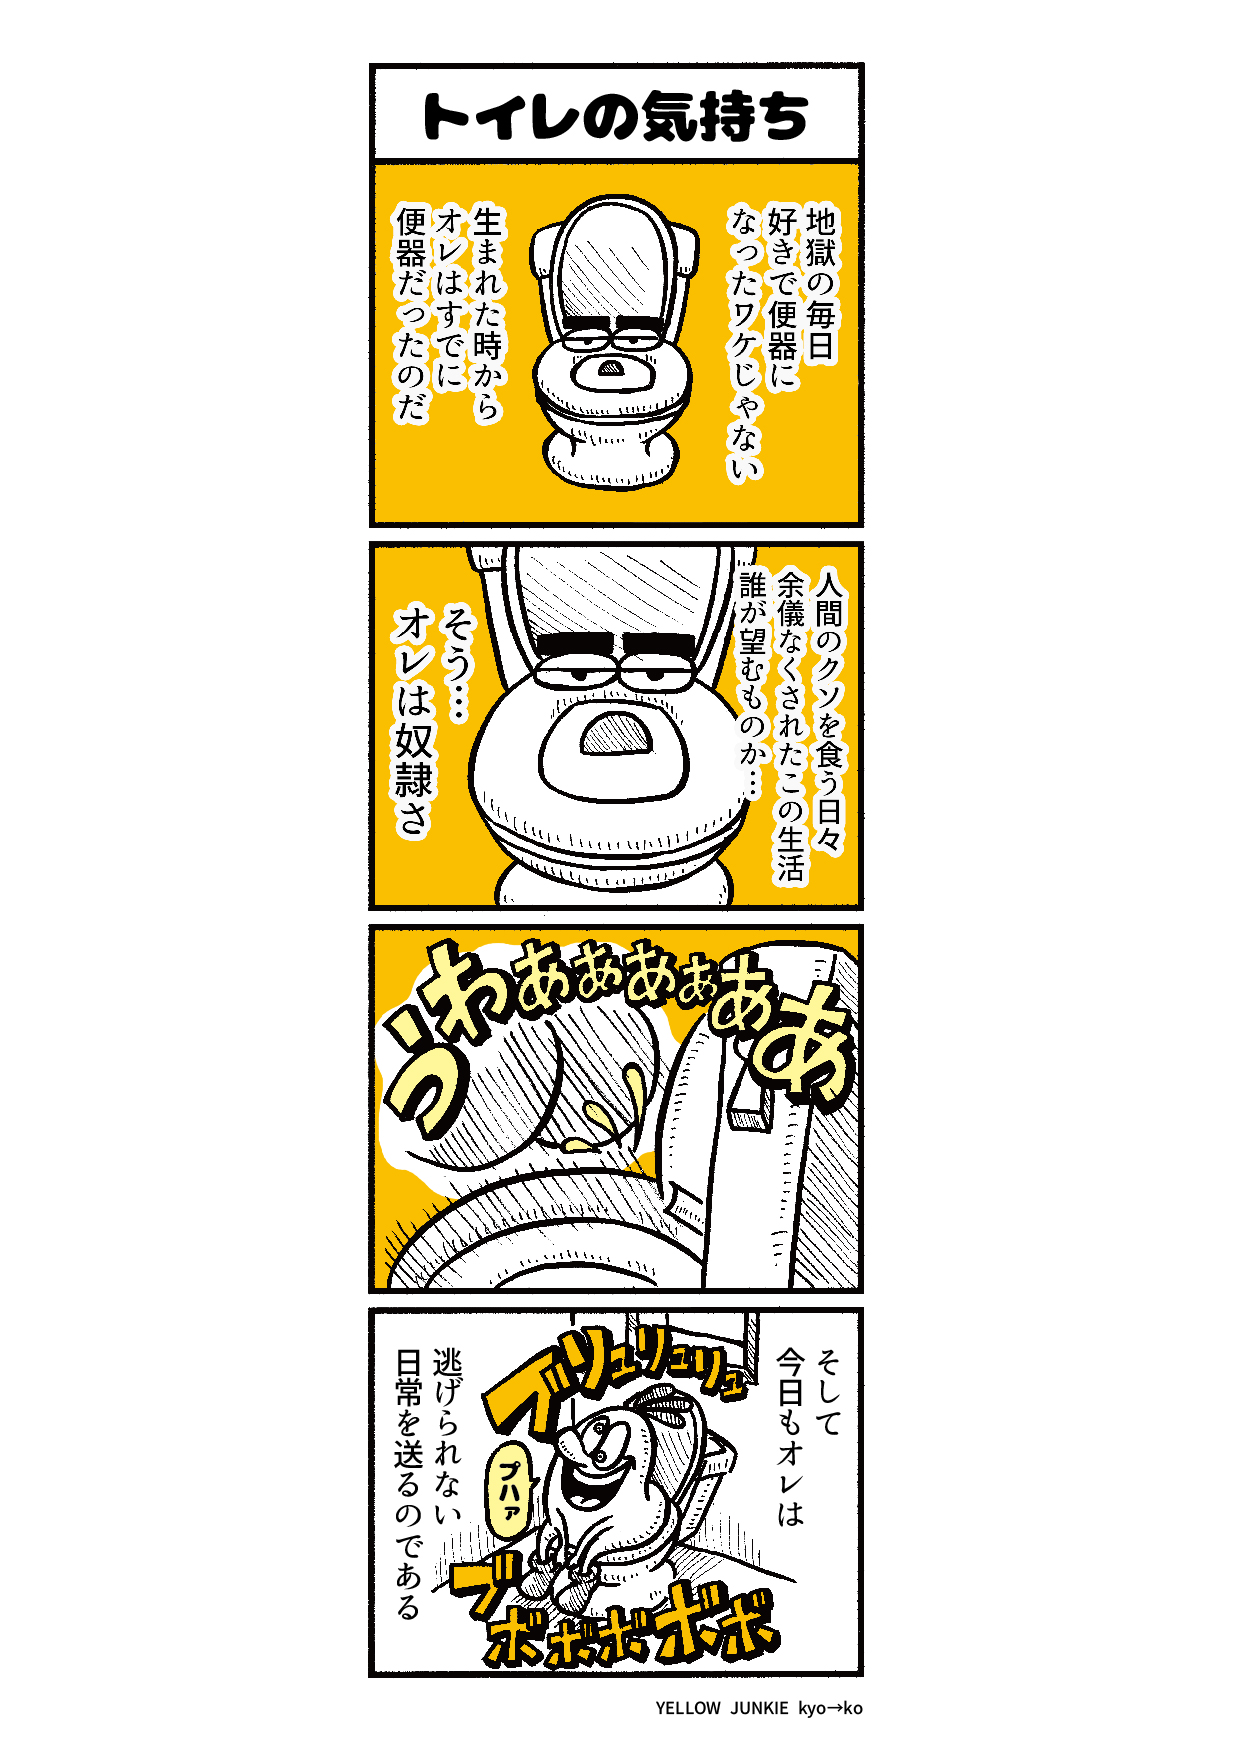 YELLOW JUNKIE「26話:トイレの気持ち」